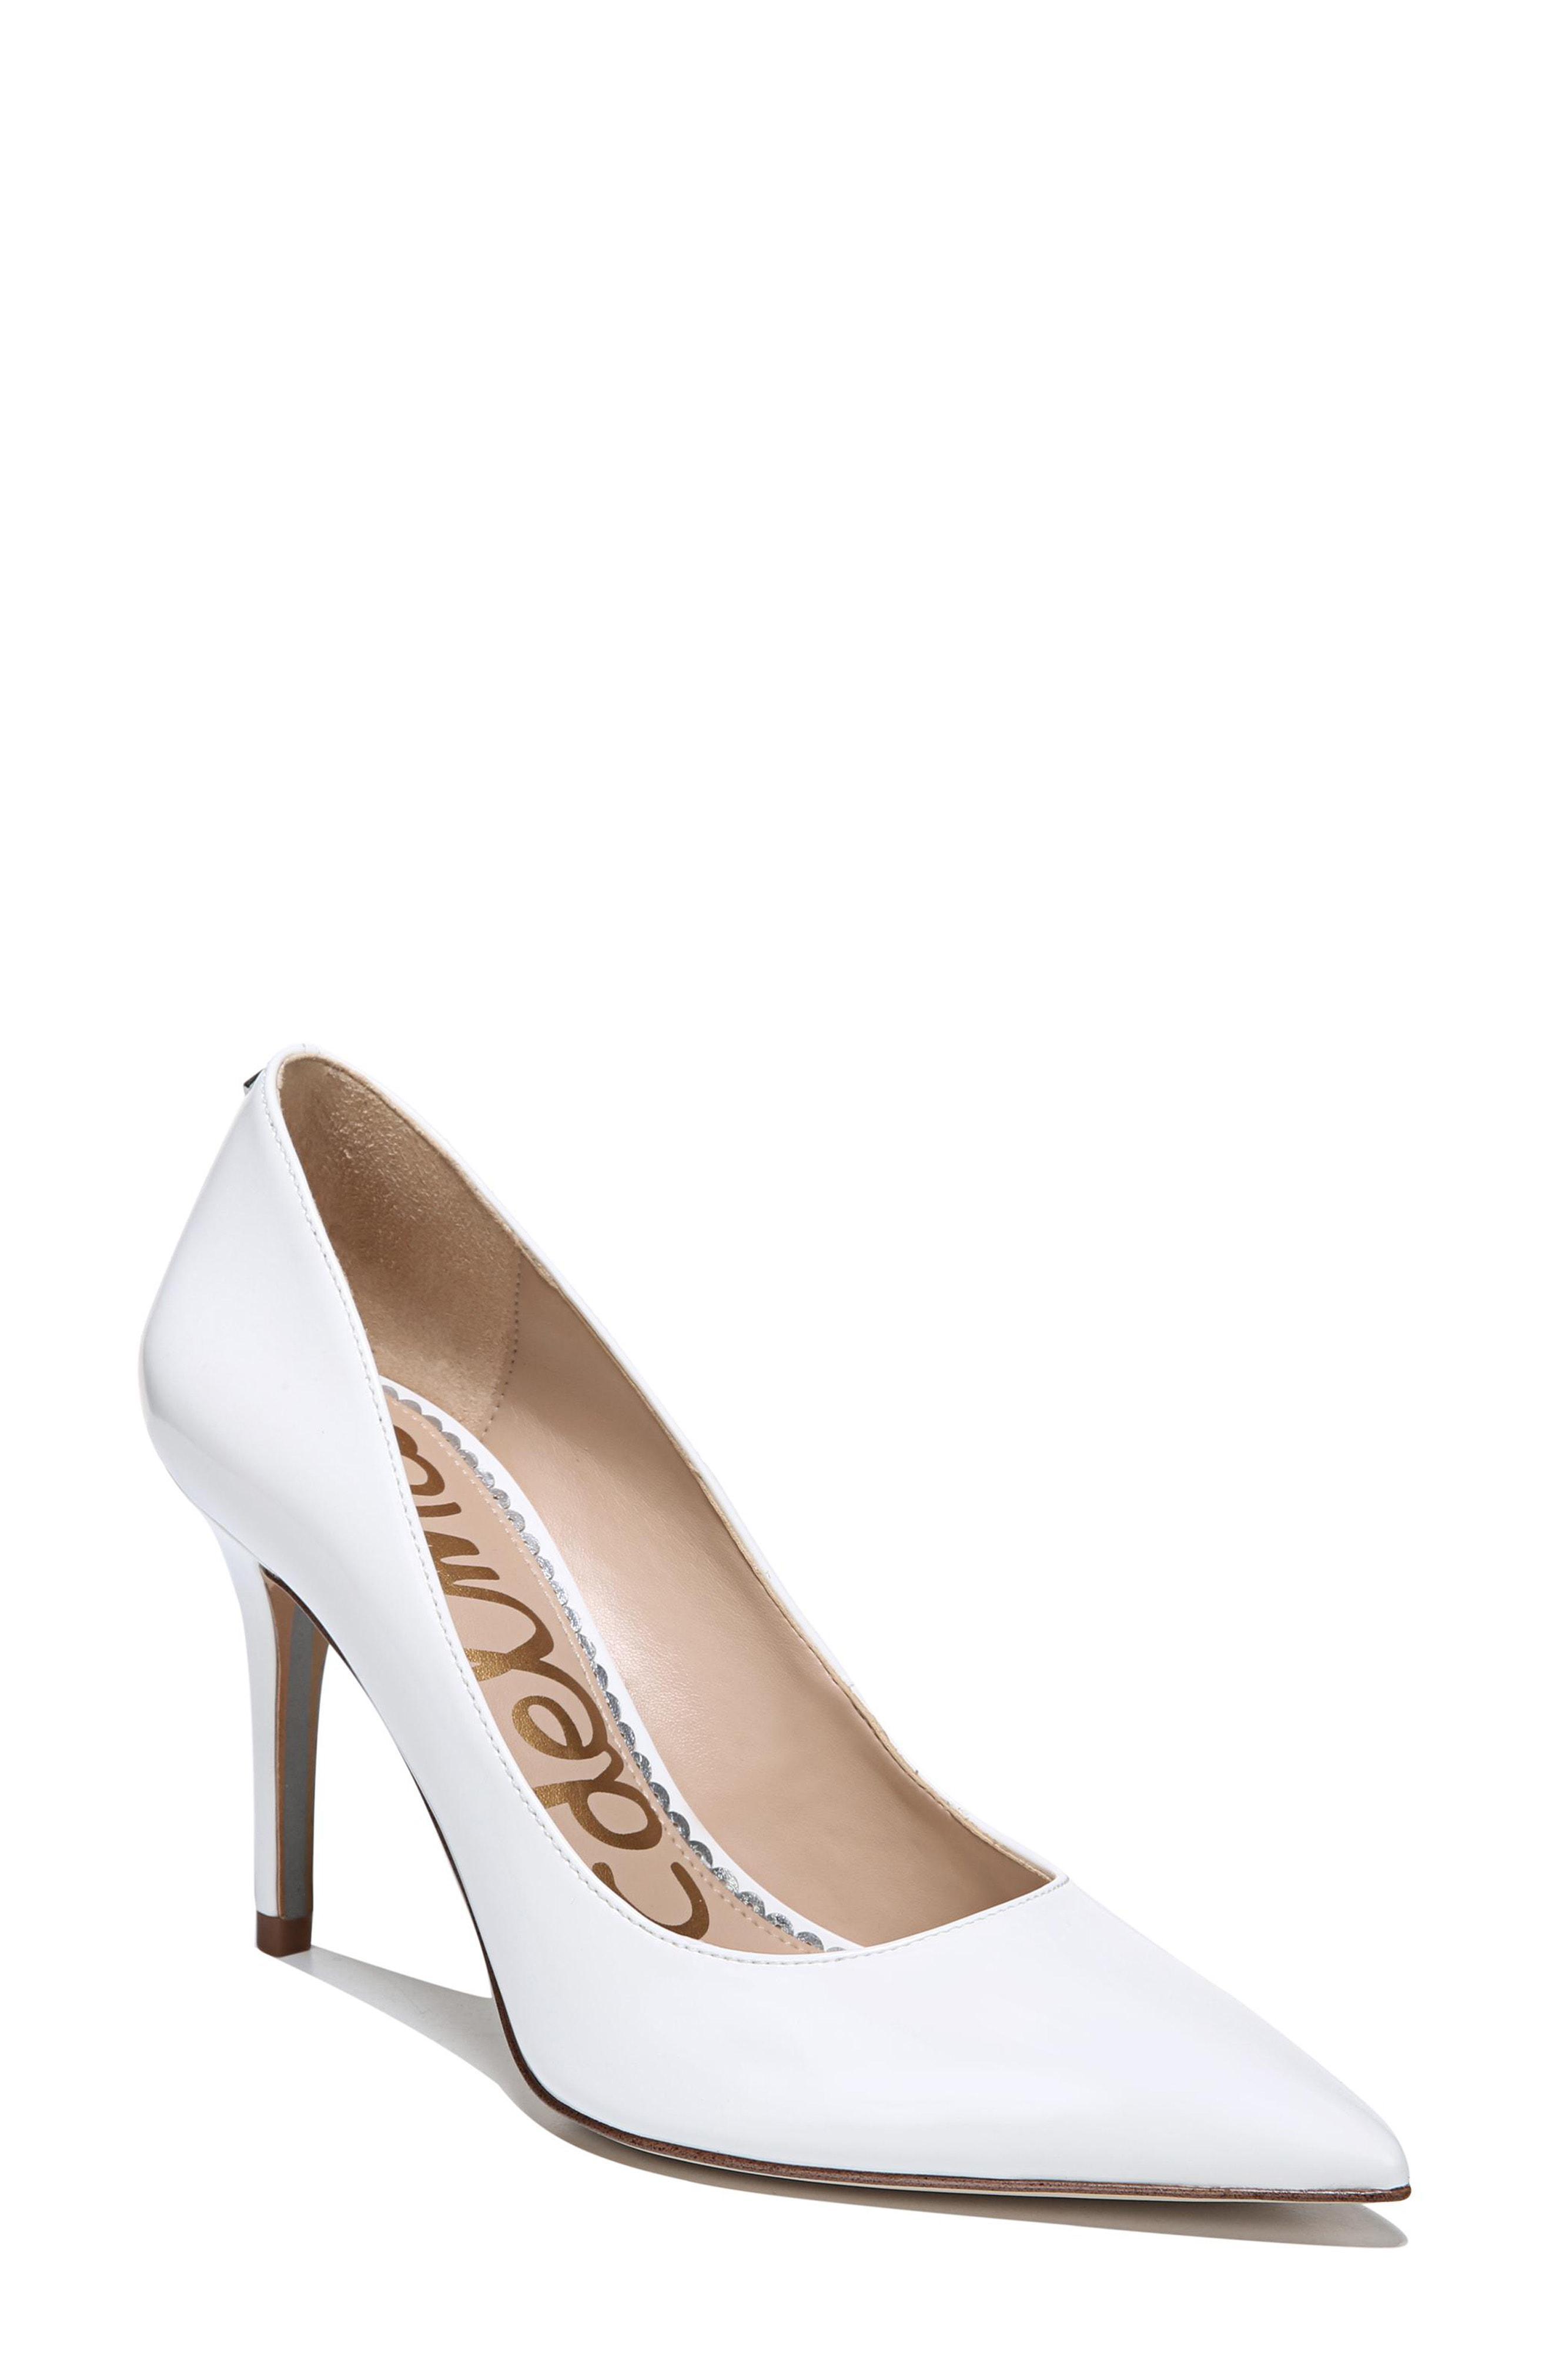 b4966d985d7a Lyst - Sam Edelman Hazel Pump Bright White in White - Save 62%